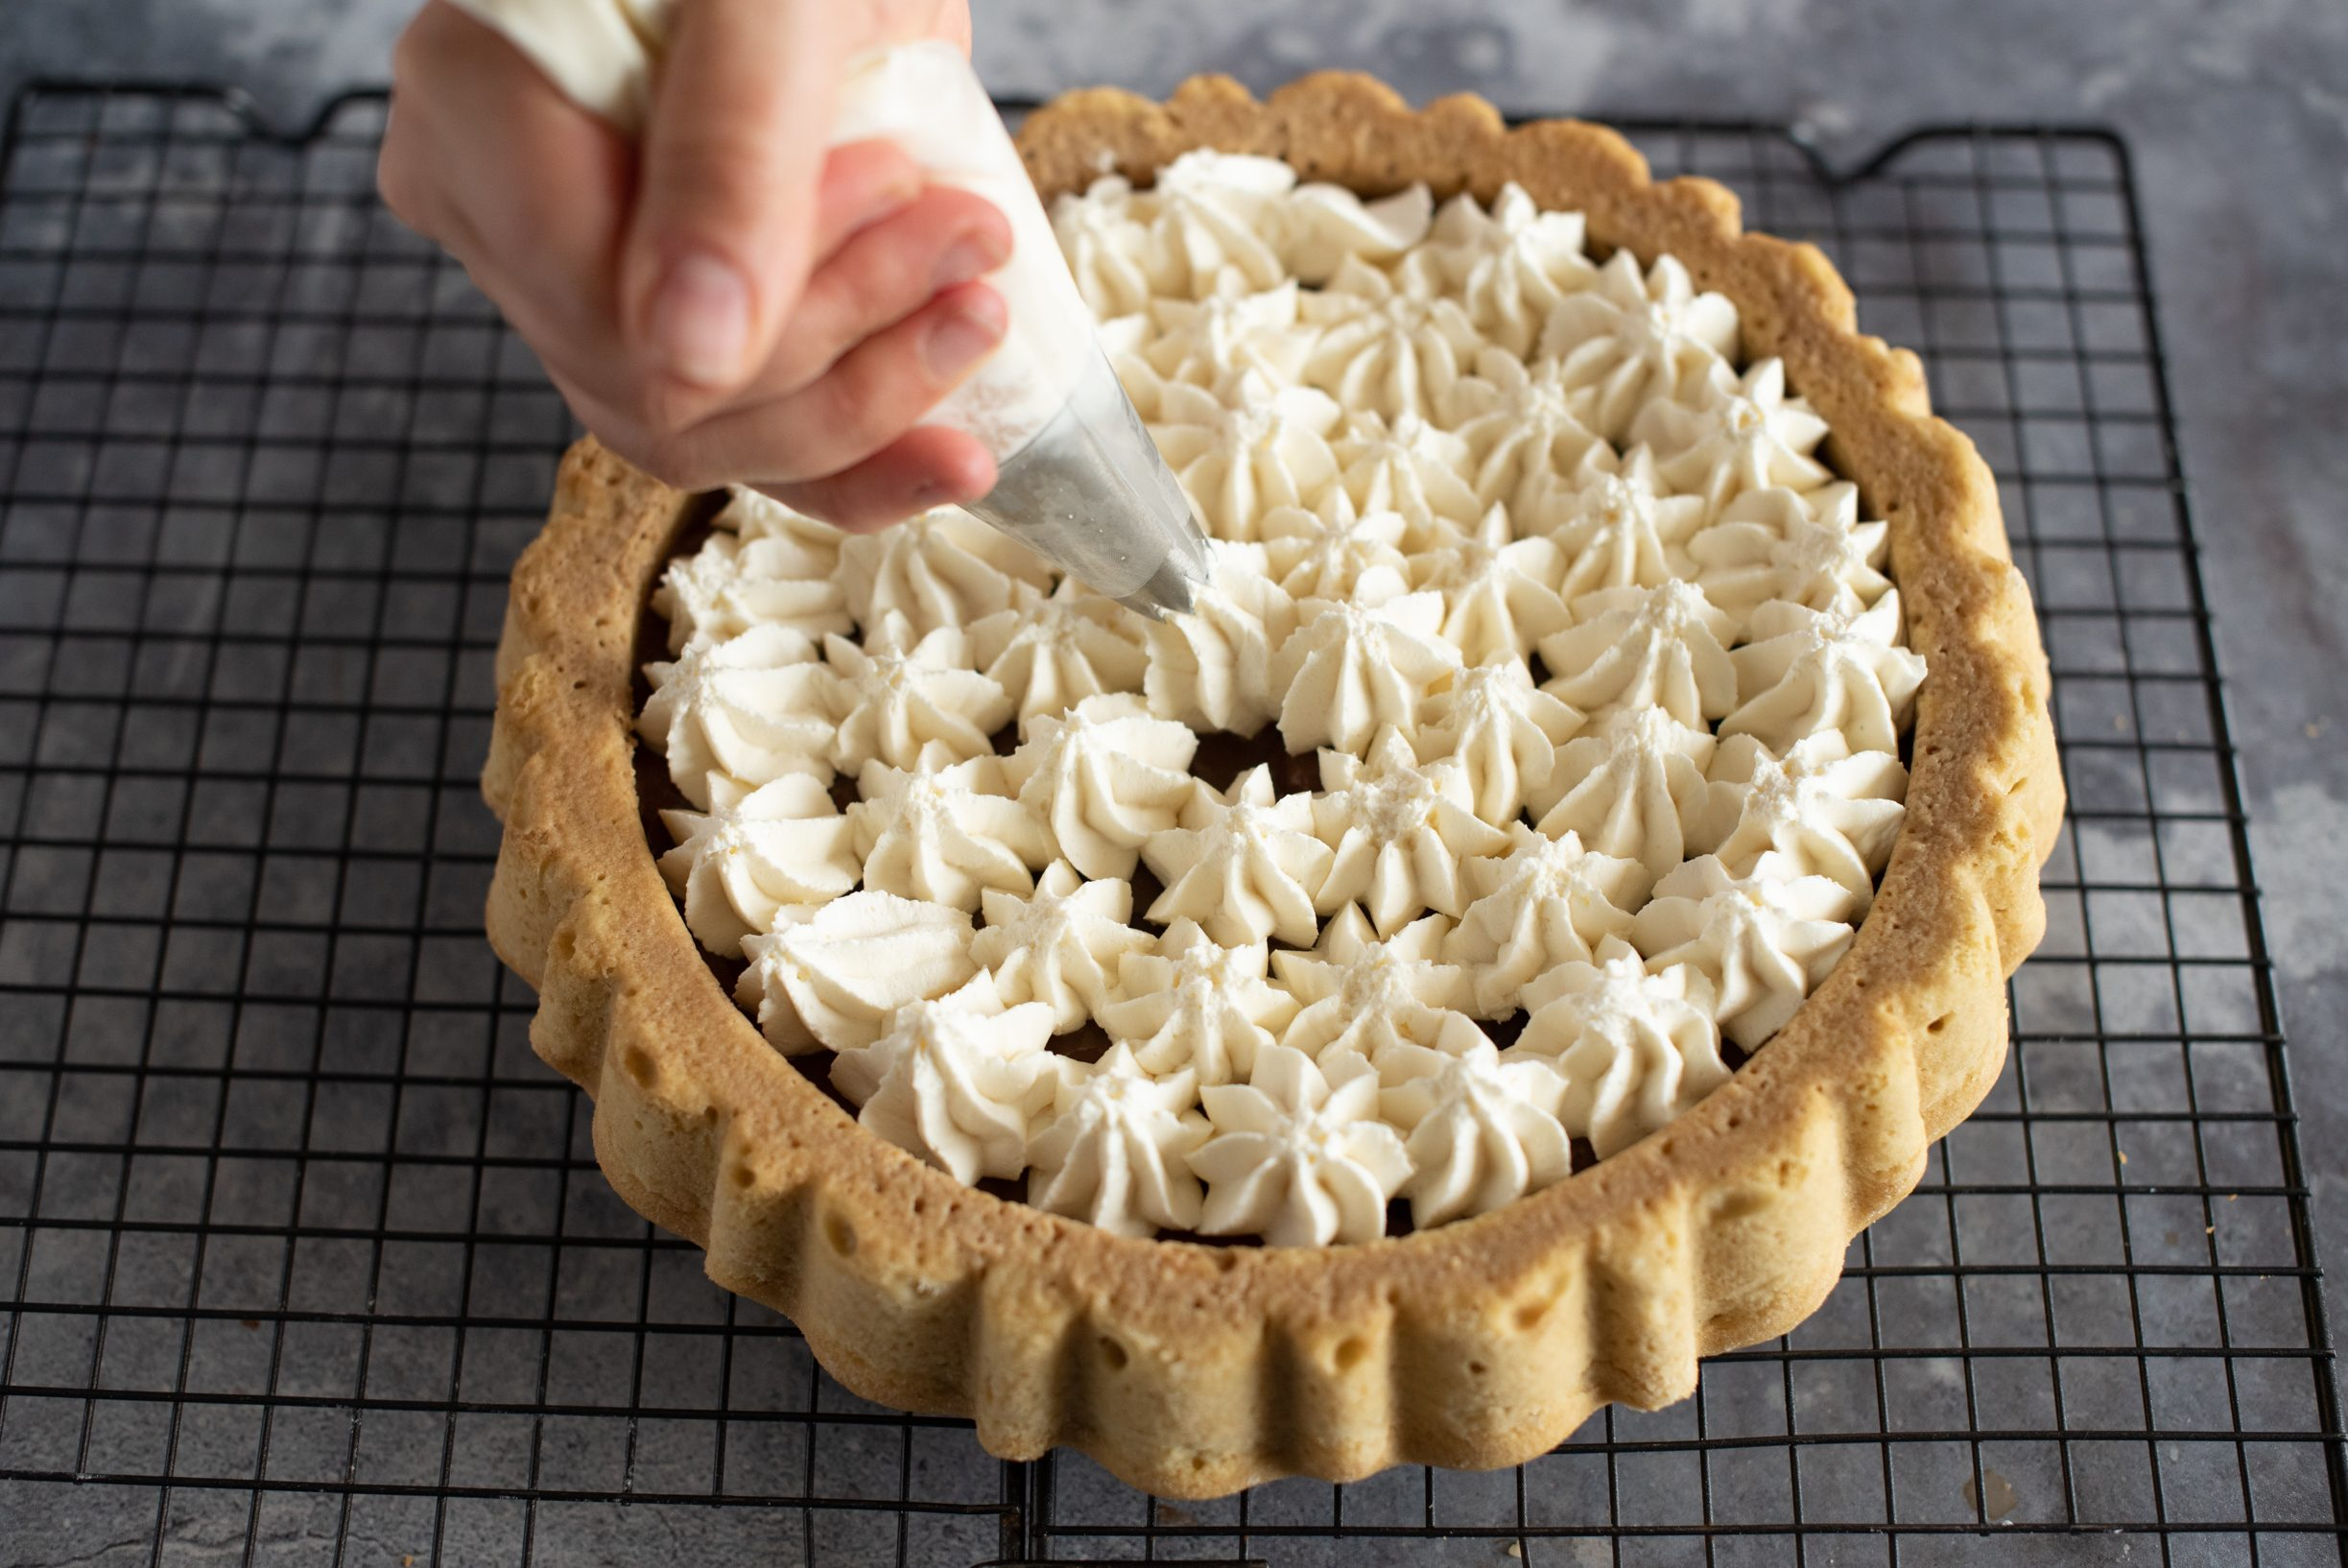 Crostata morbida al tiramisù, distribuire la crema